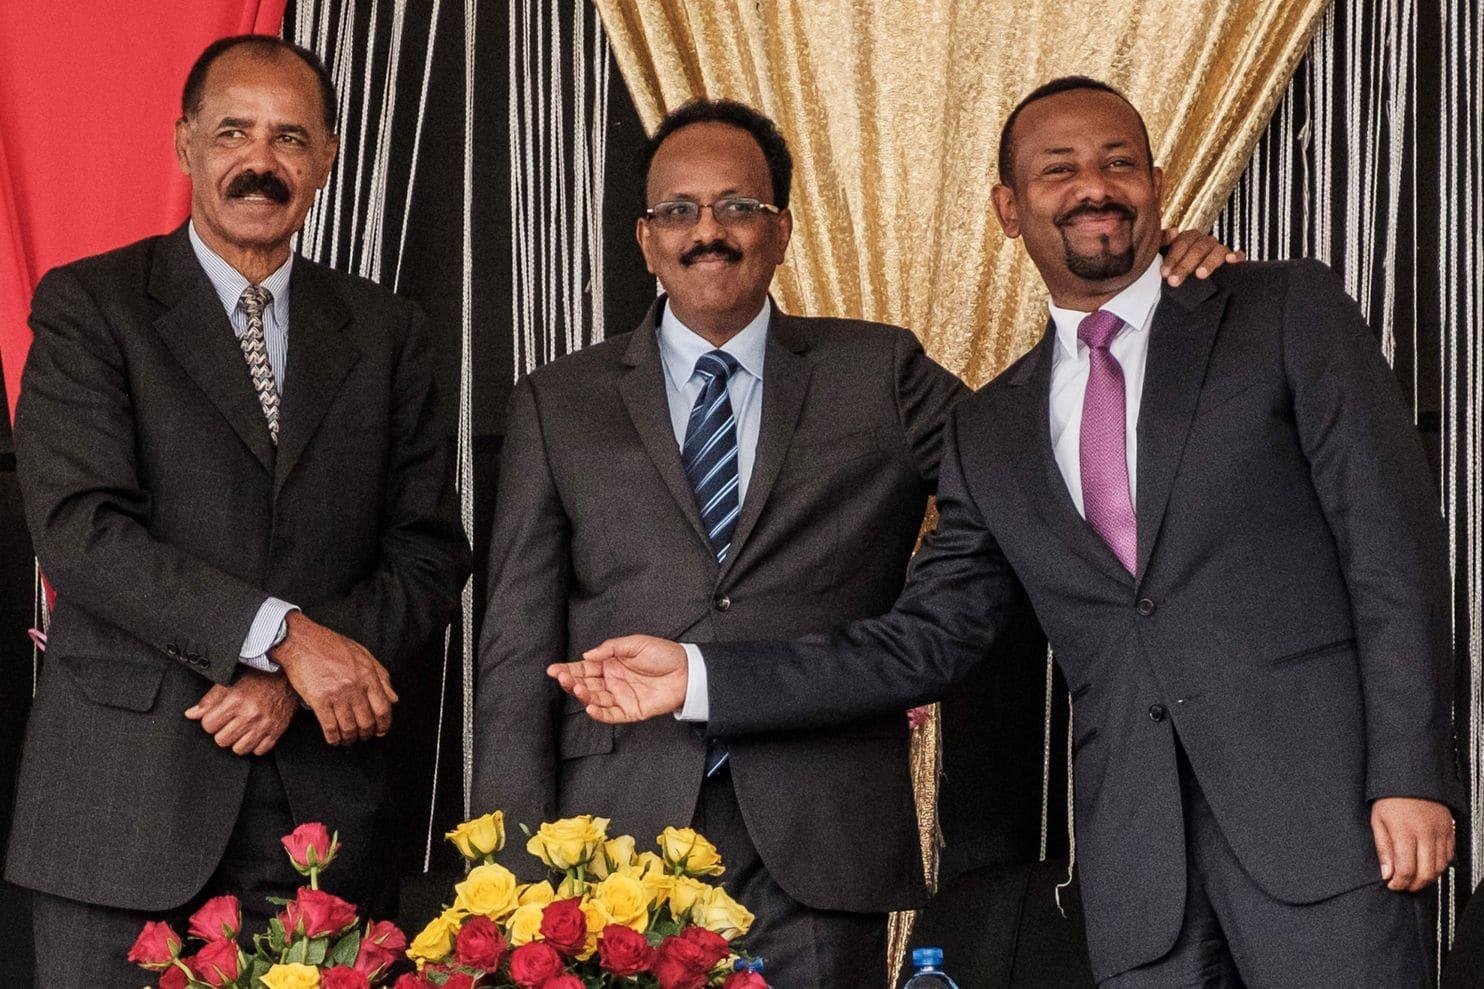 Tripartite Summits between Eritrea, Somalia, and Ethiopia